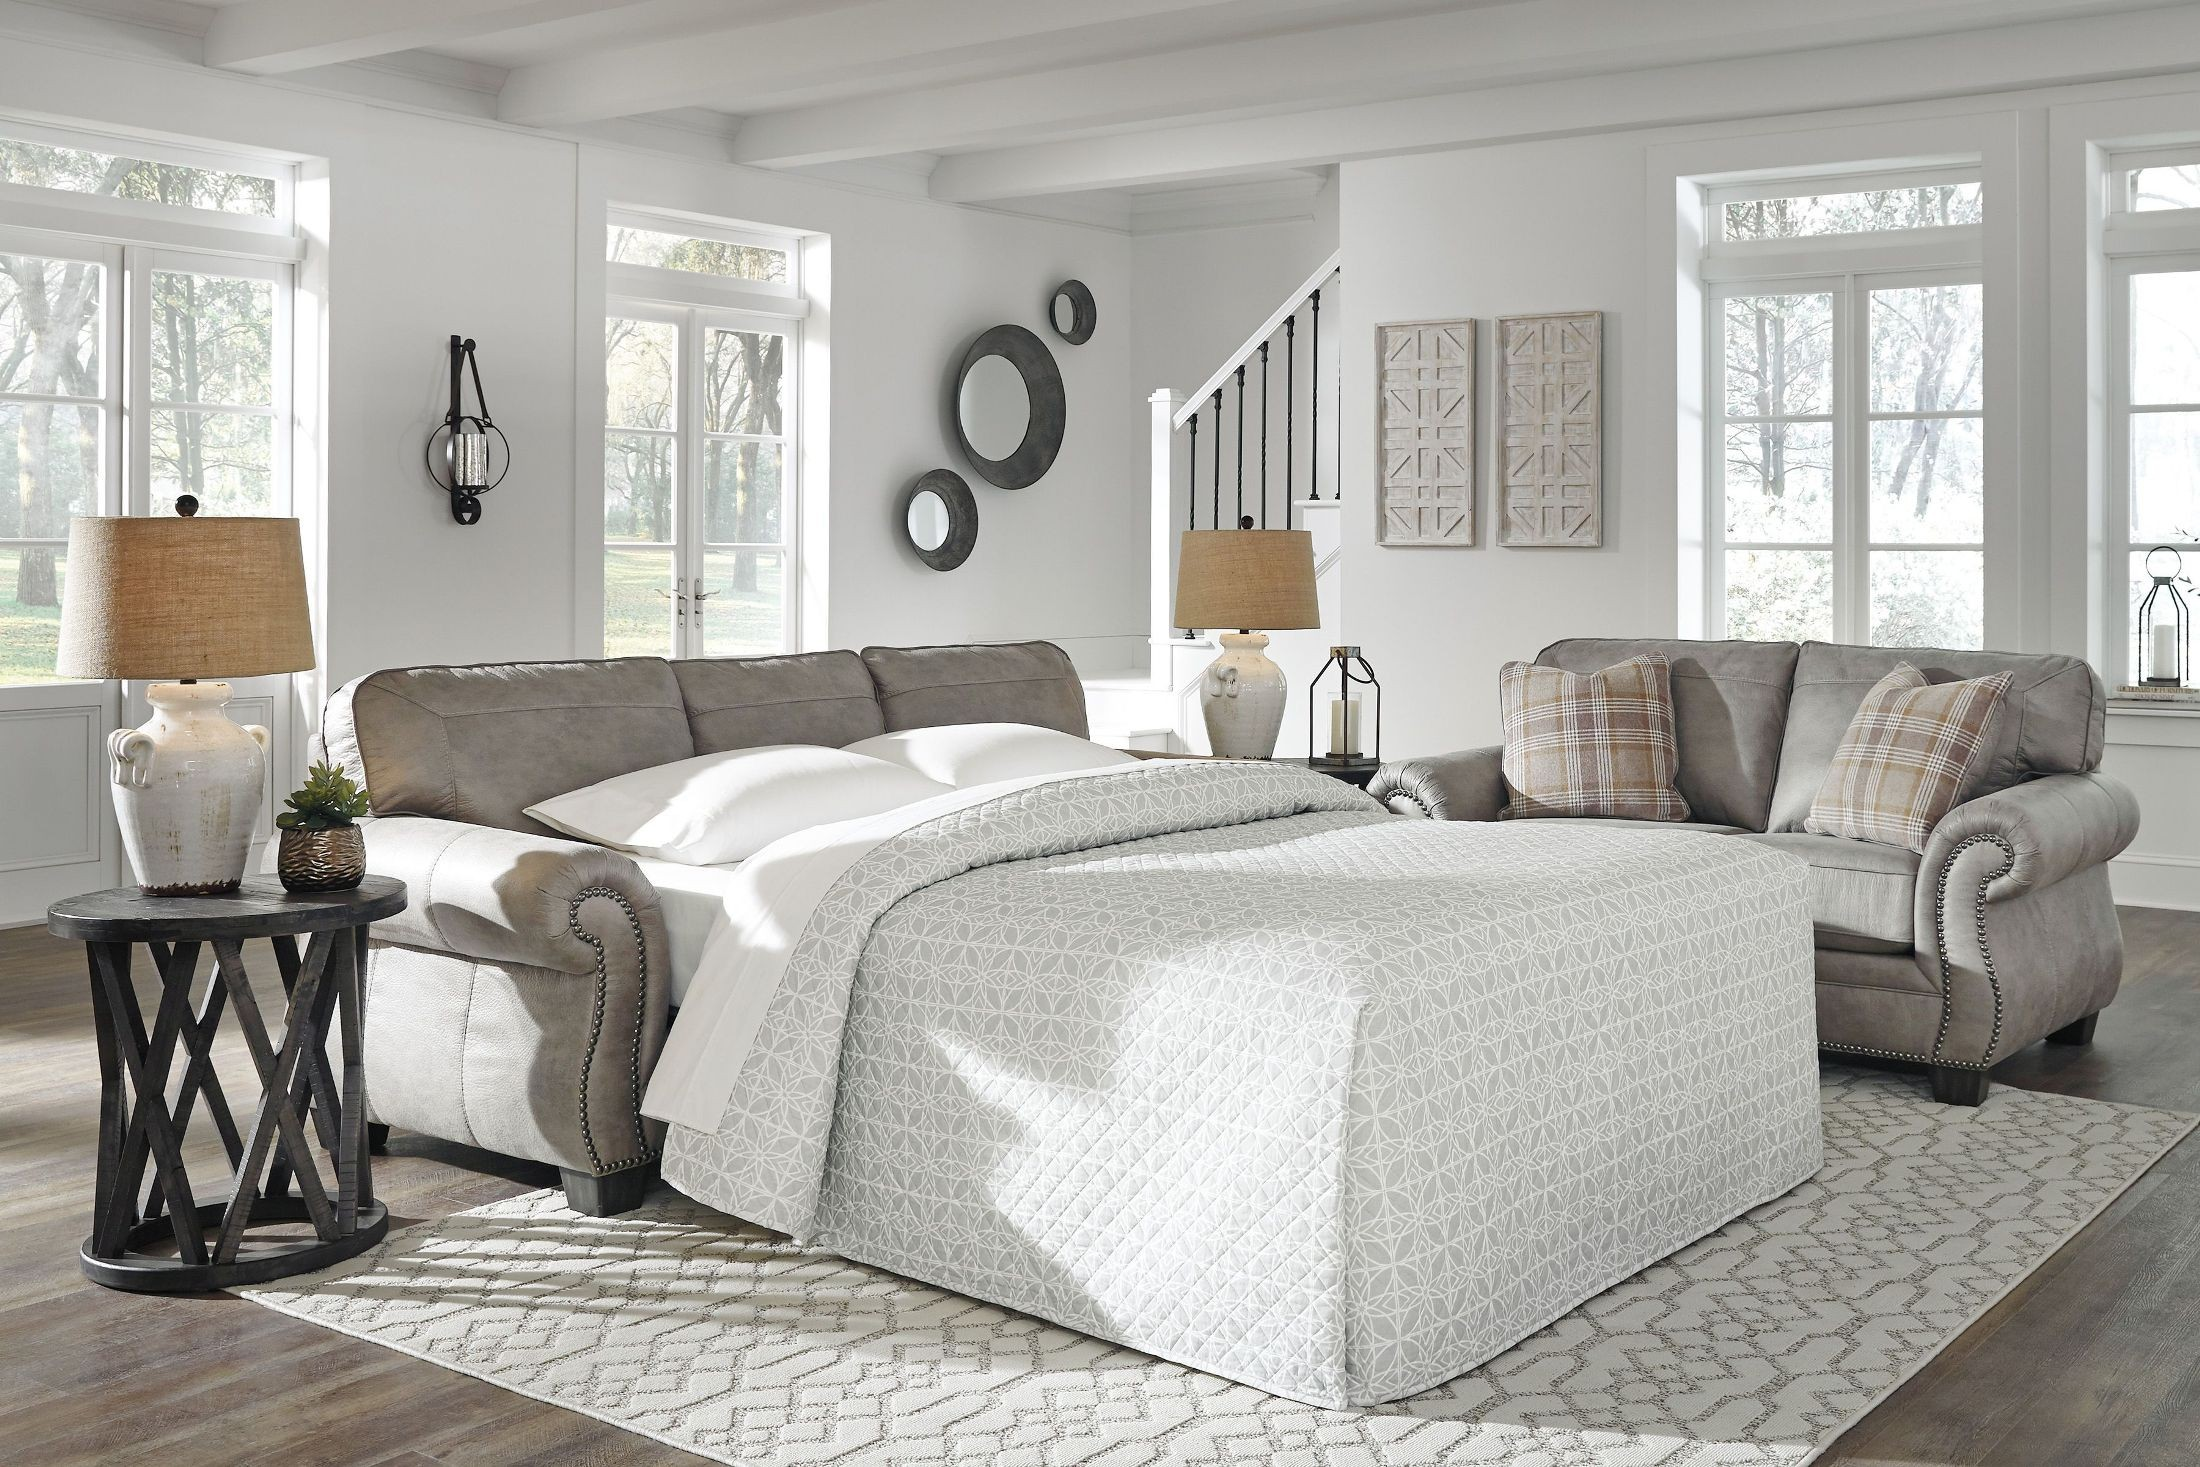 Olsberg Steel Living Room Set from Ashley | Coleman Furniture